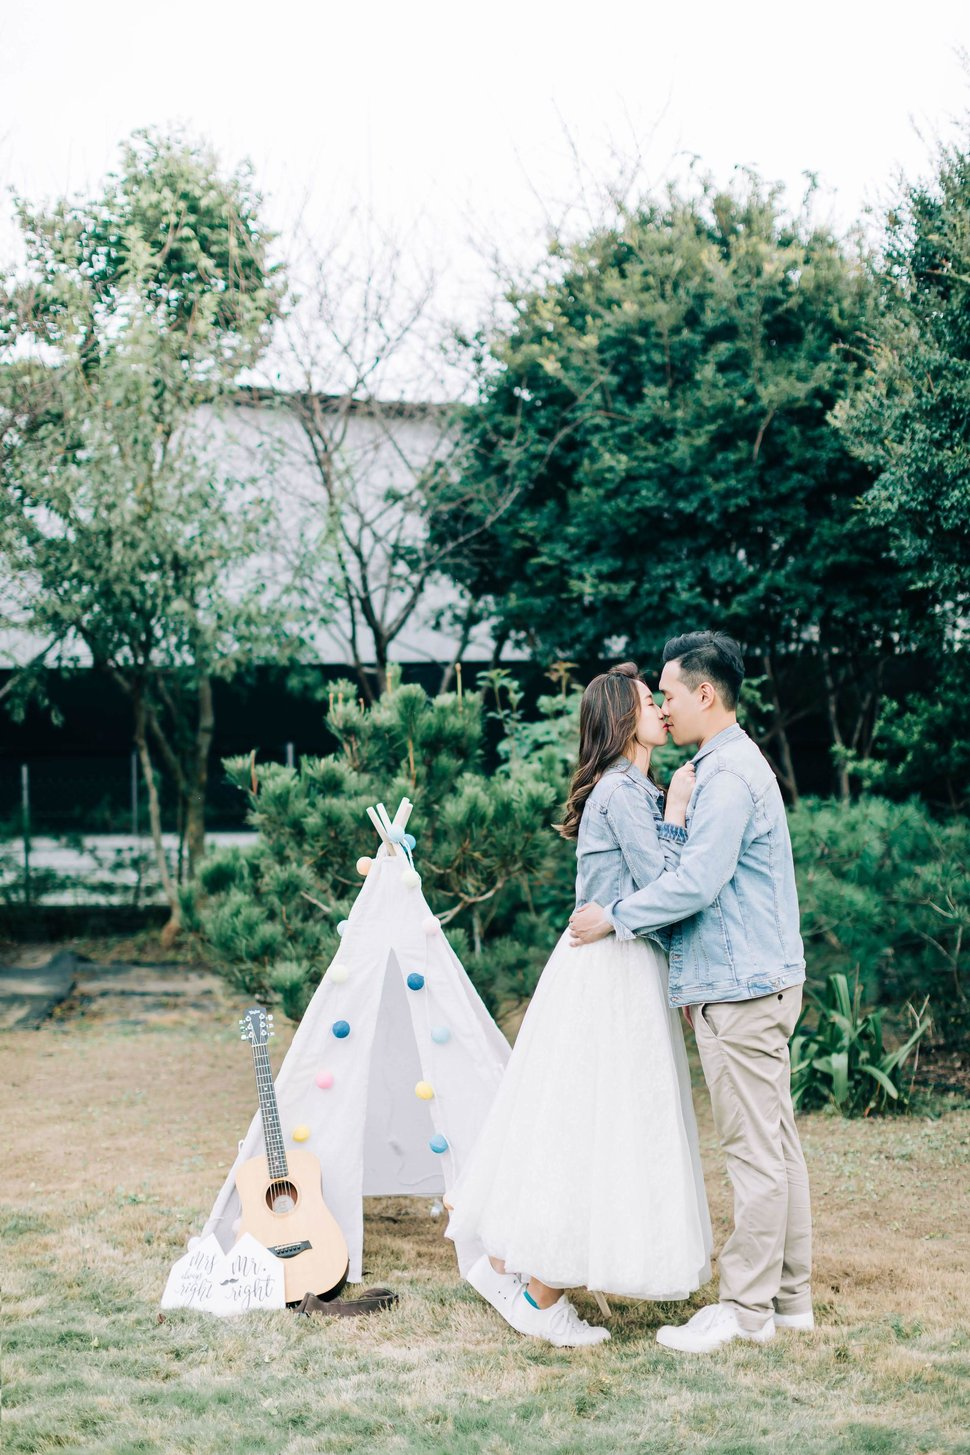 AG3_7198A - Cradle Wedding搖籃手工婚紗《結婚吧》